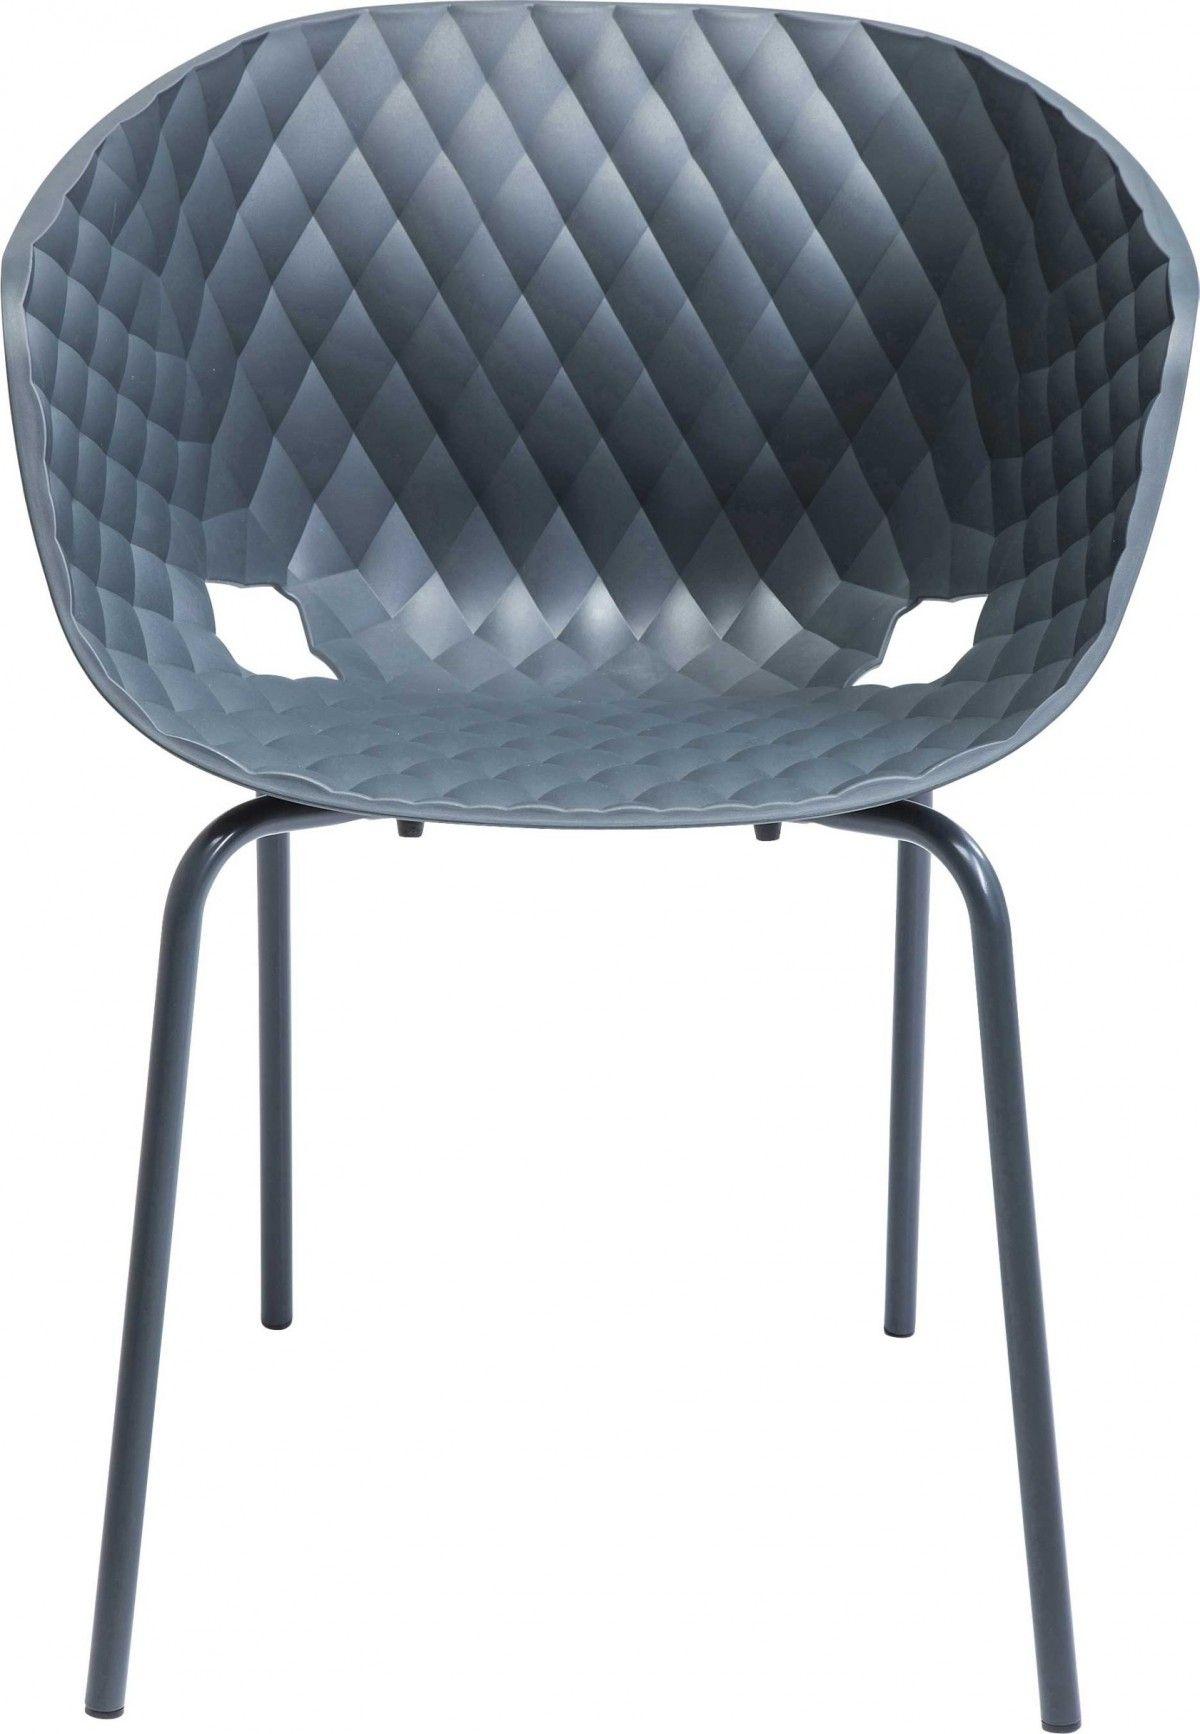 KARE Design - Stühle -Stuhl mit Armlehne Radar Bubble Anthrazit ...